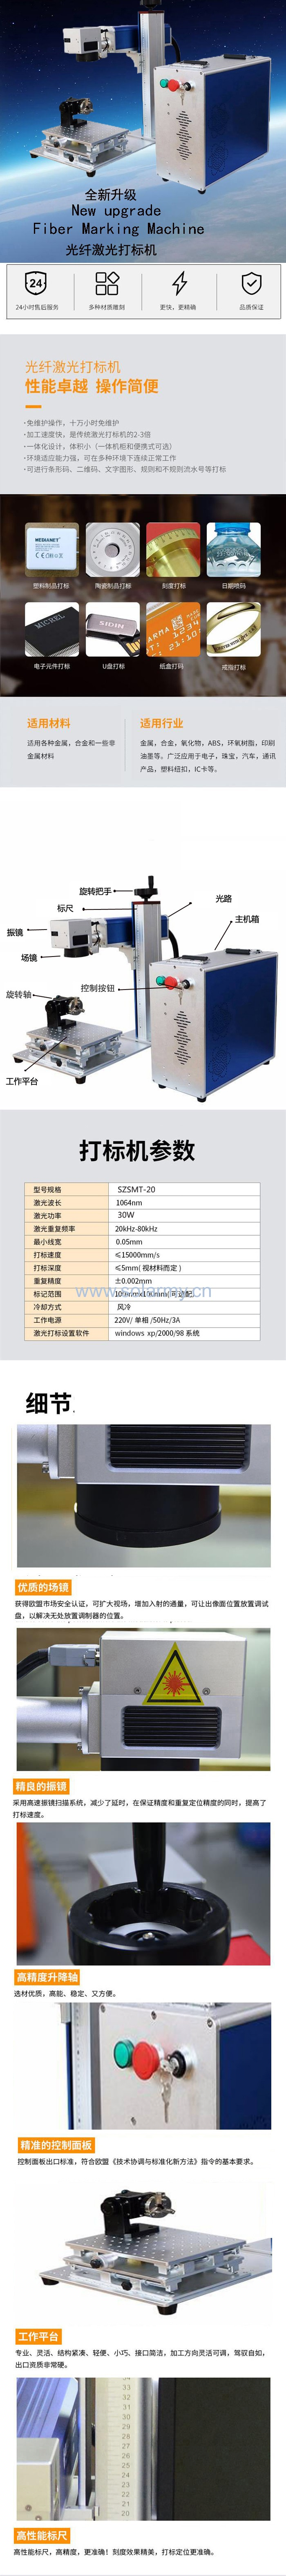 20W桌面机光纤中文.jpg